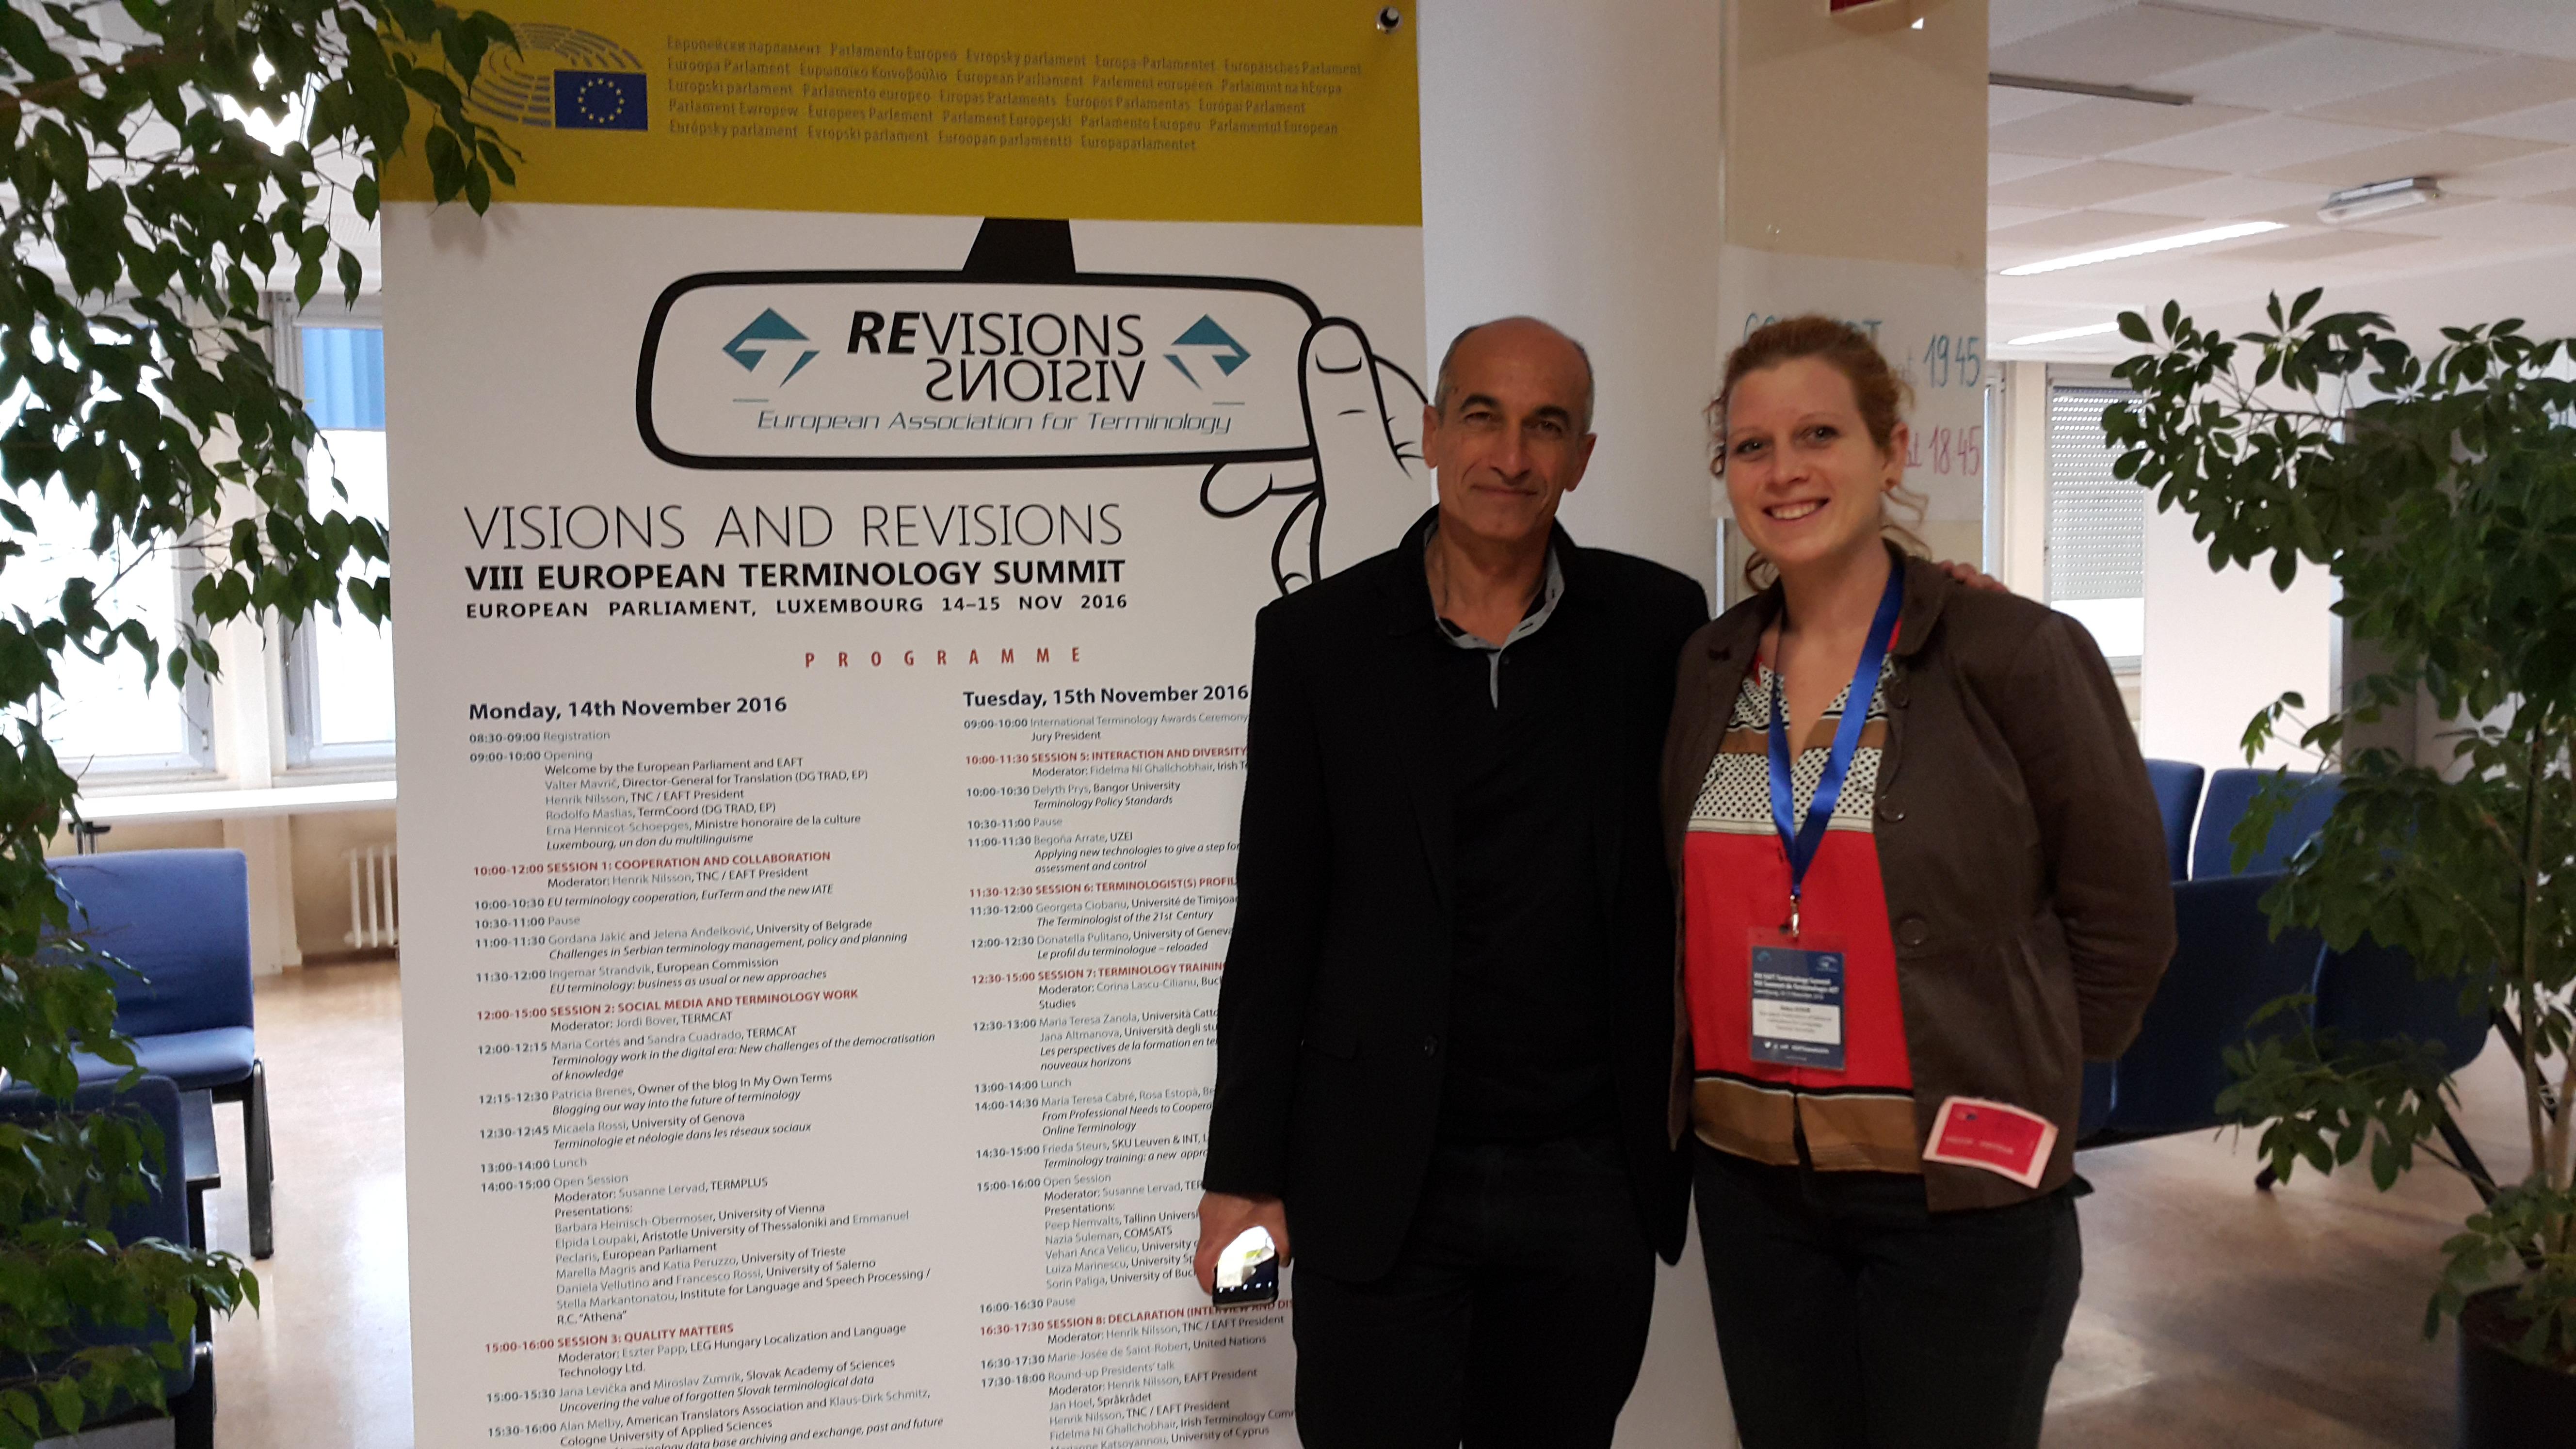 EFNIL at the European Terminology Summit 2016